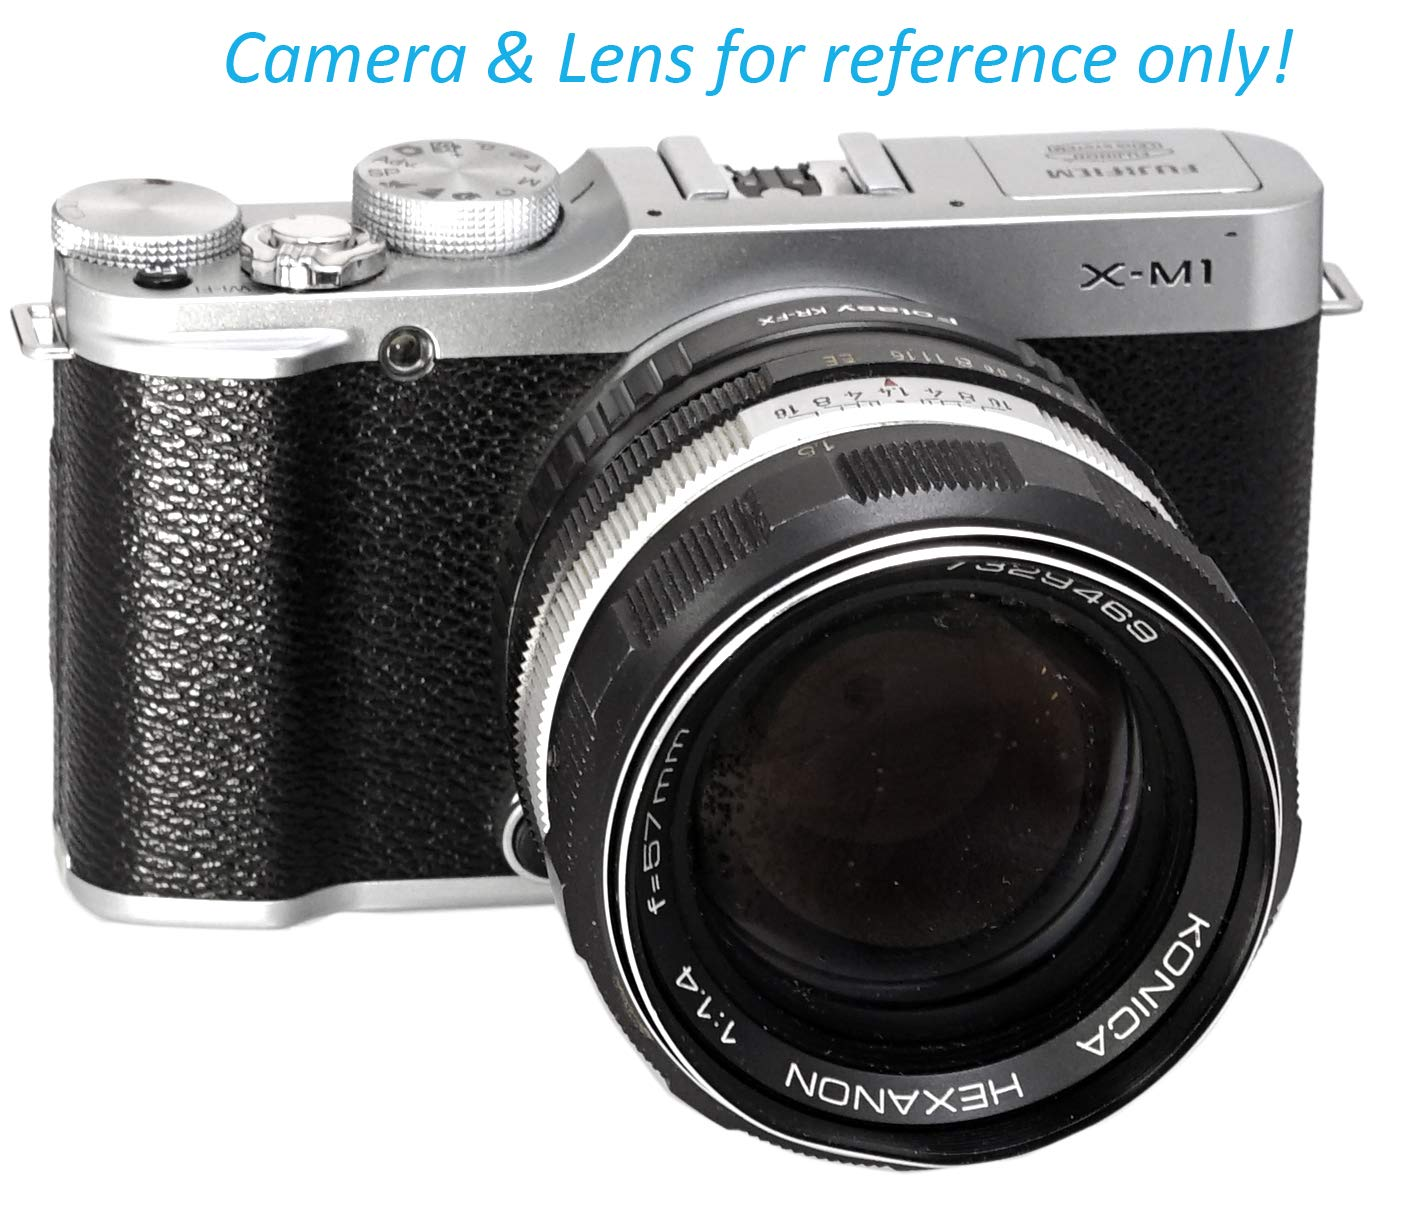 Fotasy Manual Nikon Lens to Fuji X Macro Focusing Helicoid Adapter fits Fujifilm X-Pro2 X-Pro3 X-E2 X-E3 X-A7 X-A10 X-T1 X-T2 X-T3 X-T10 X-T20 X-T30 X-T100 X-T200 X-H1 Nikon Lens Focusing Helicoid